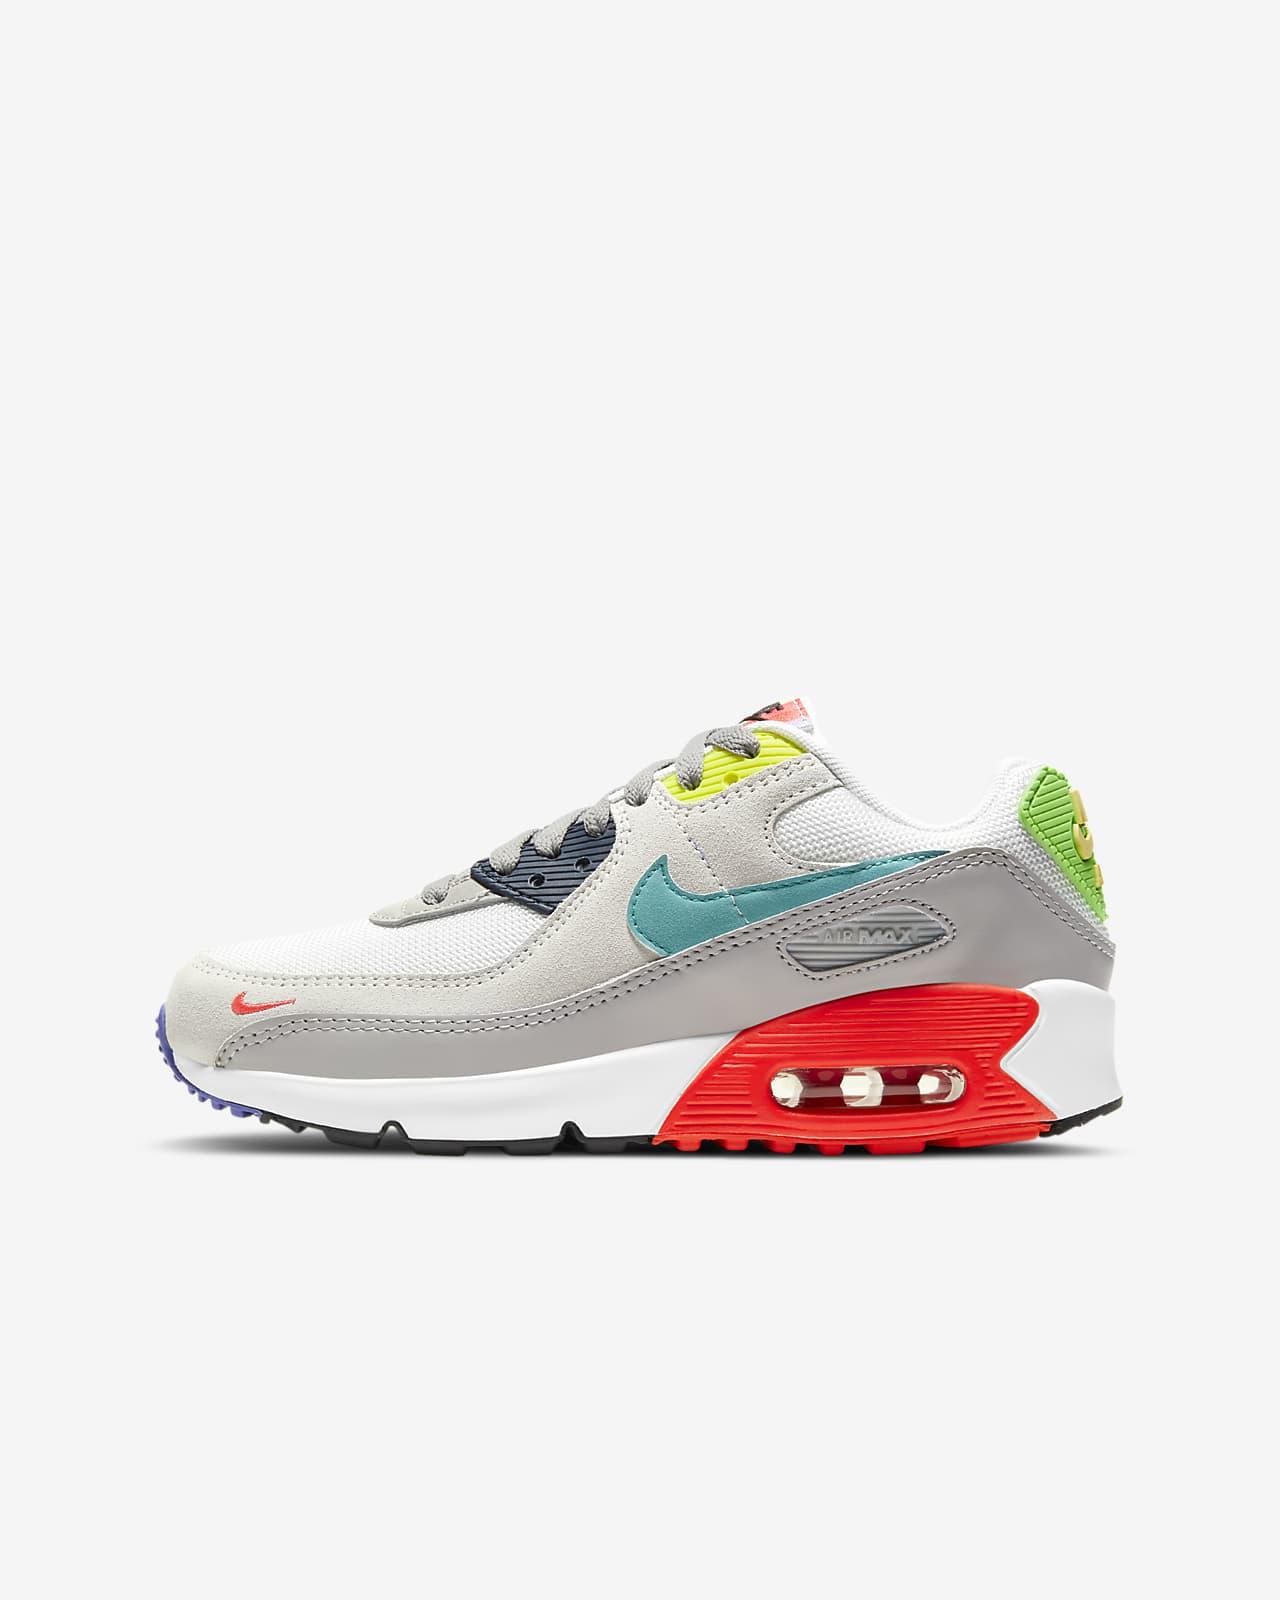 Buty dla dużych dzieci Nike Air Max 90 EOI